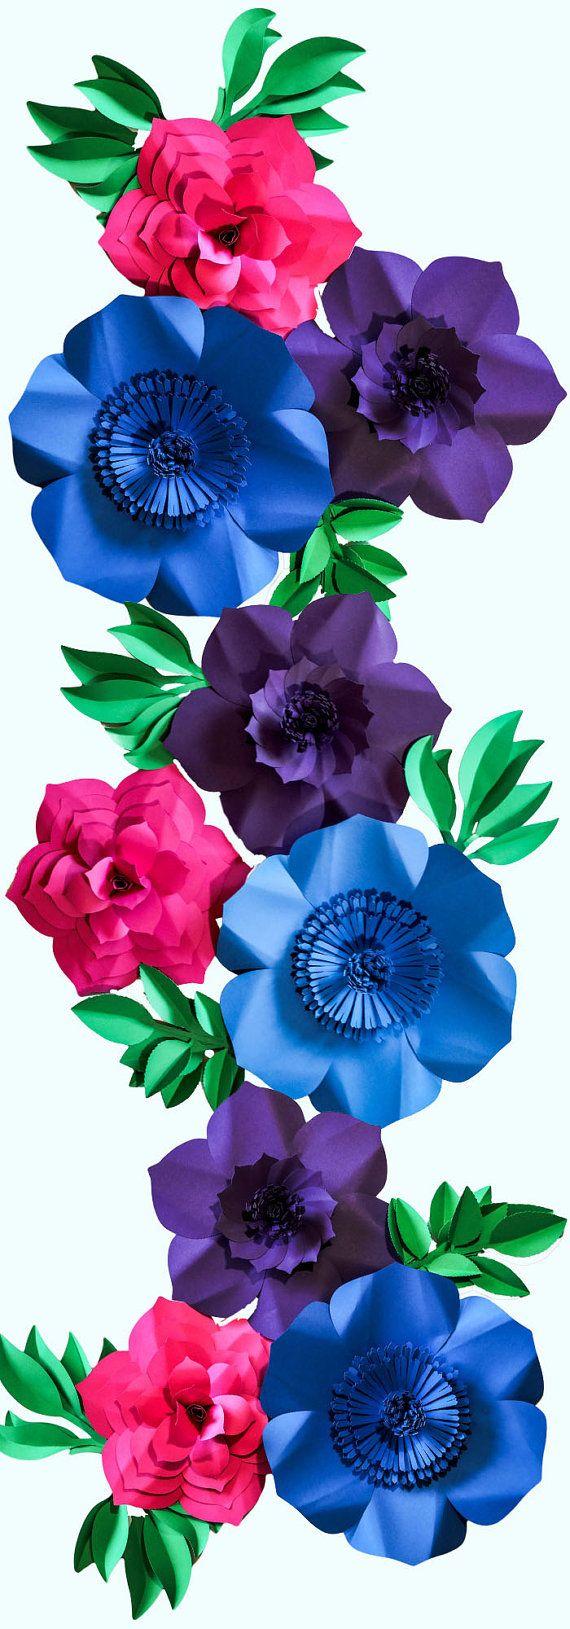 Paper Flower Backdrop, Paper Flowers, Wedding Centerpiece, Colorful Backdrop